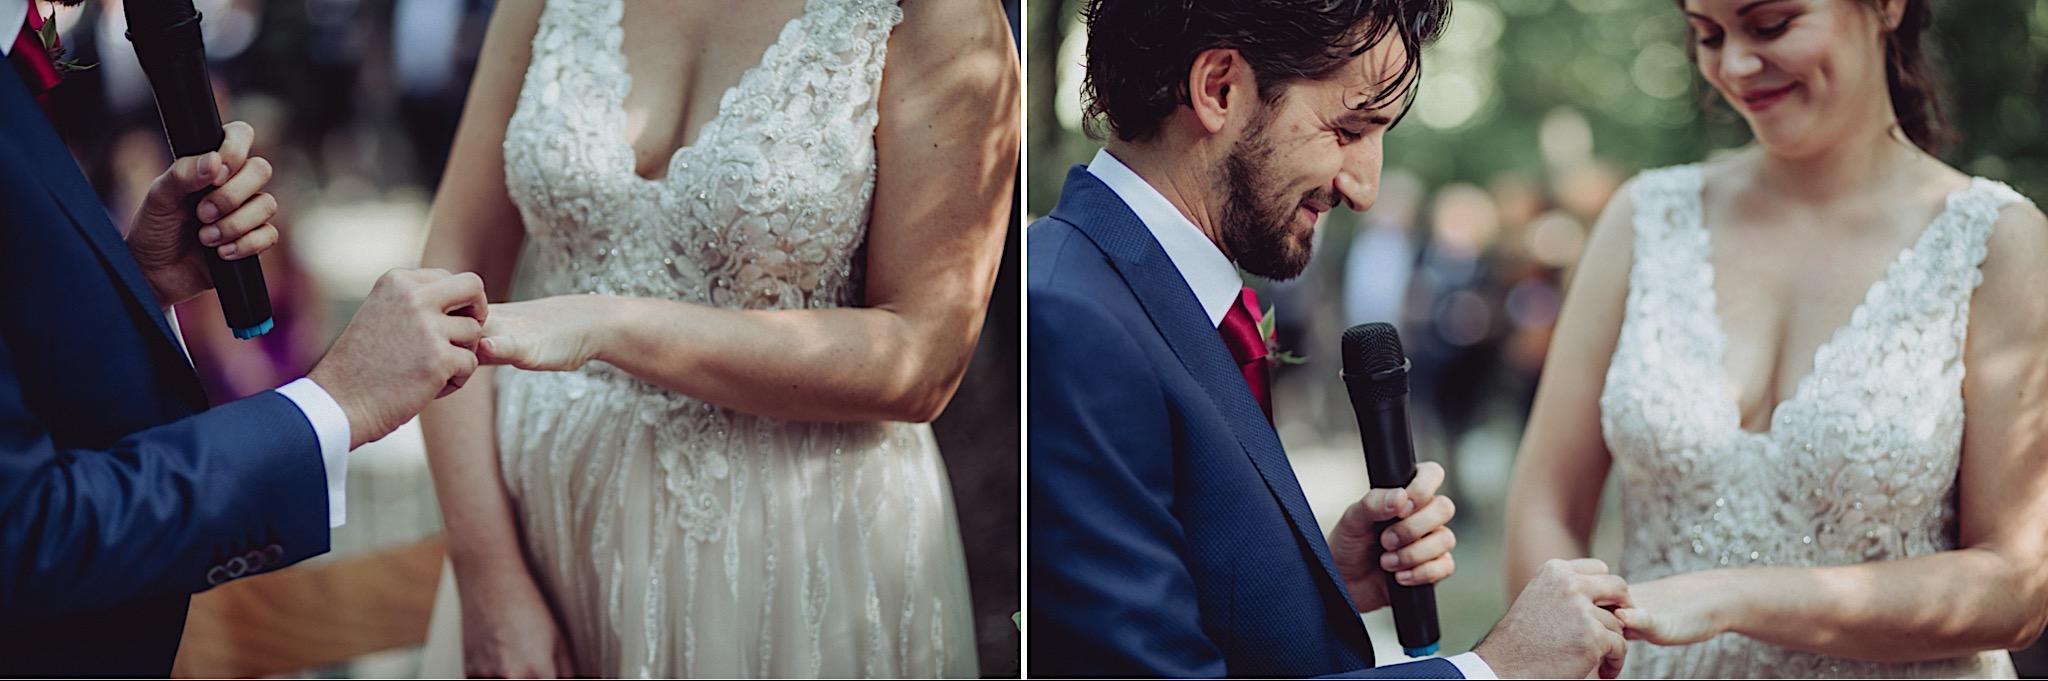 fotografo-matrimonio-villa-papafava-frassanelle-39